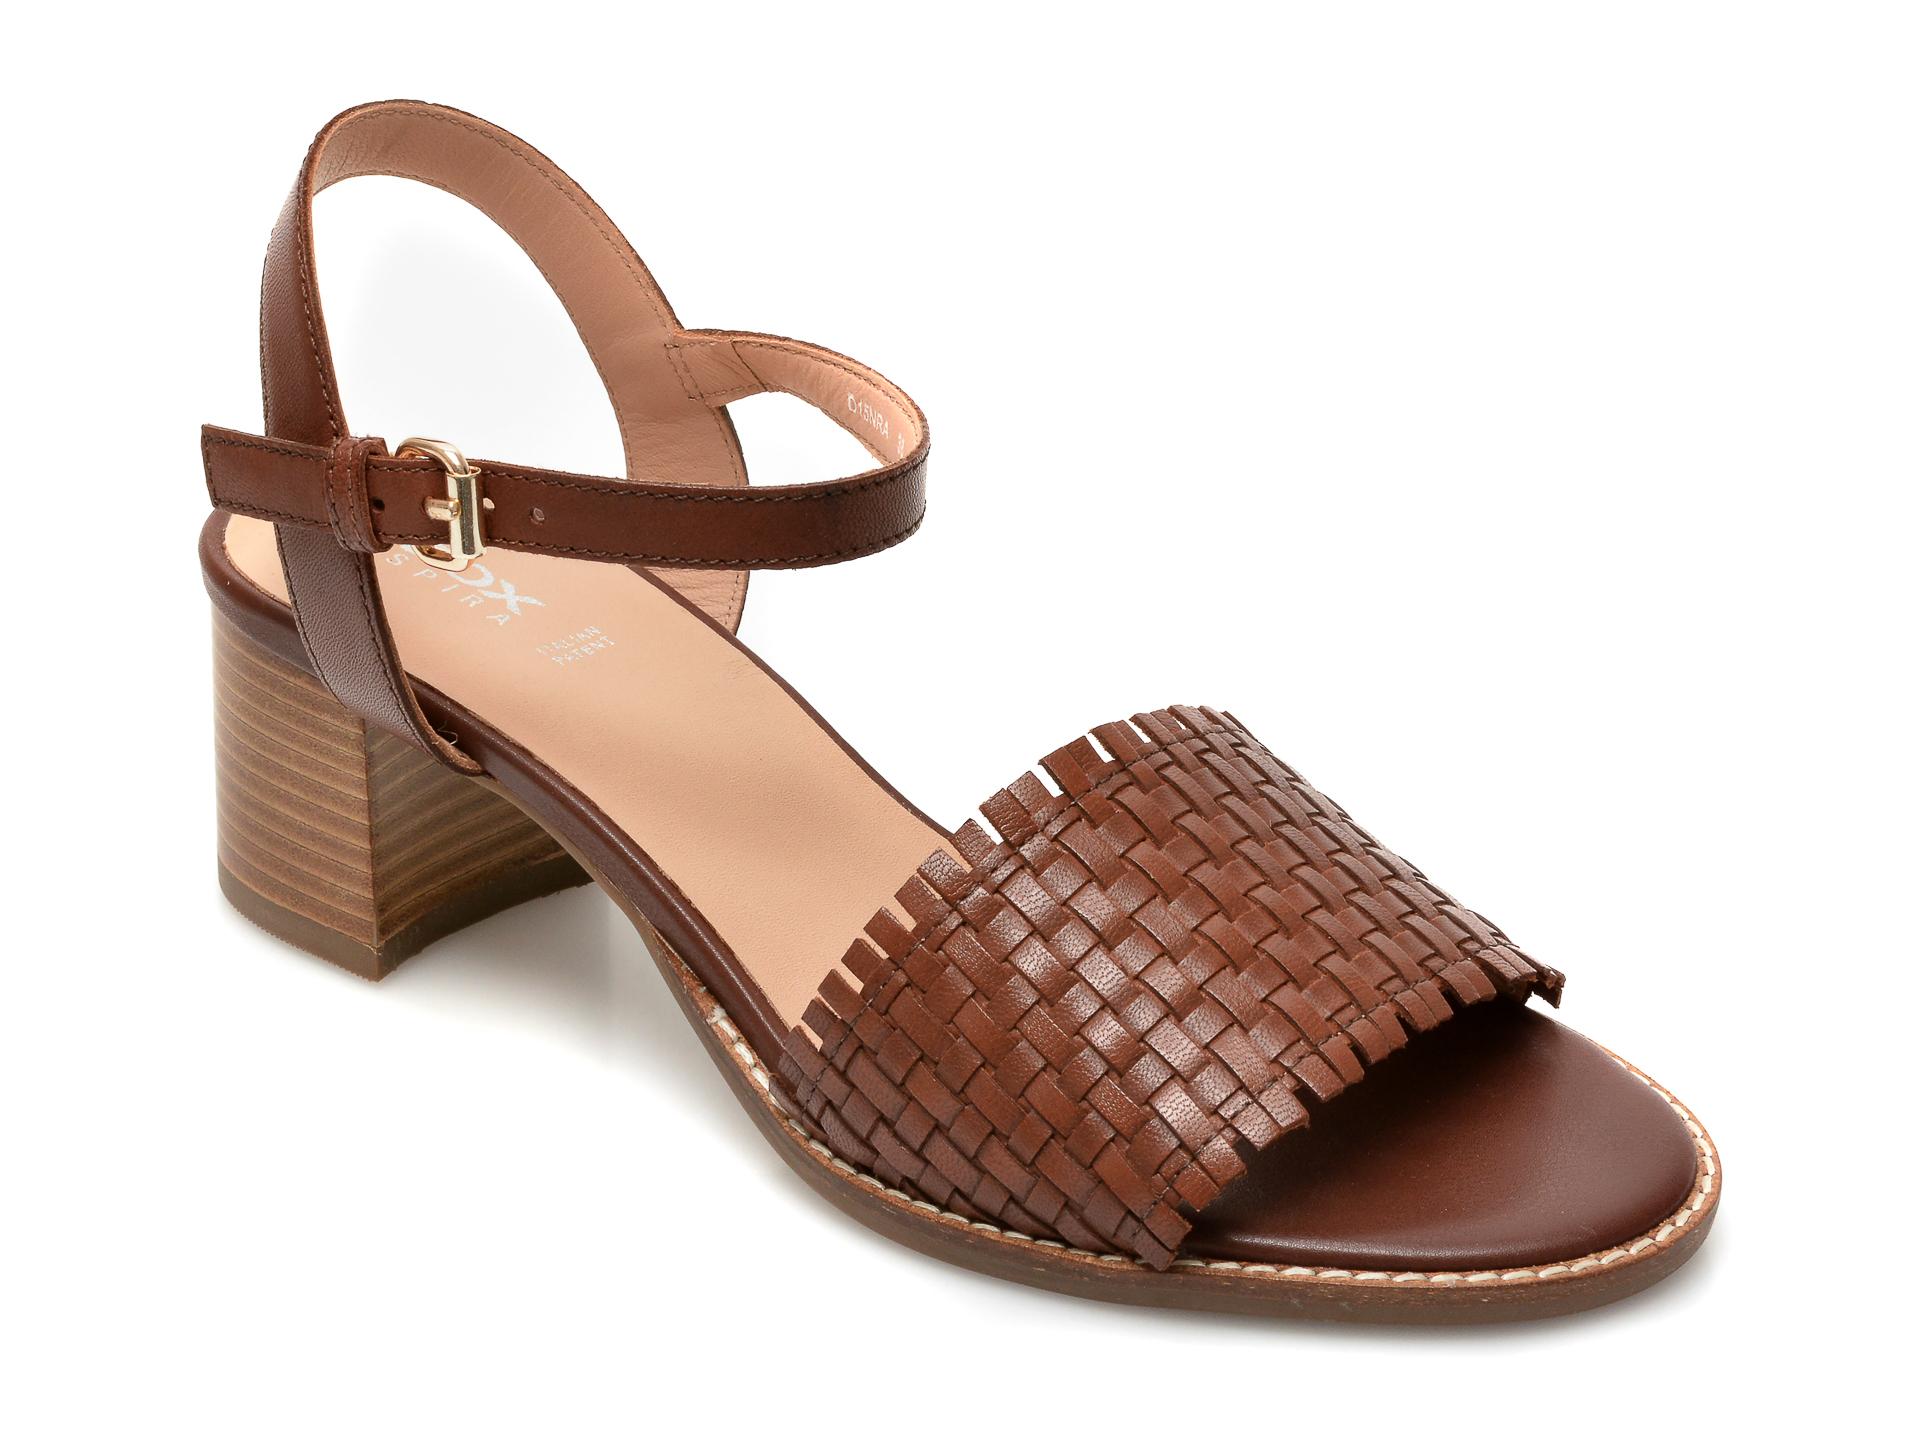 Sandale GEOX maro, D15NRA, din piele naturala imagine otter.ro 2021